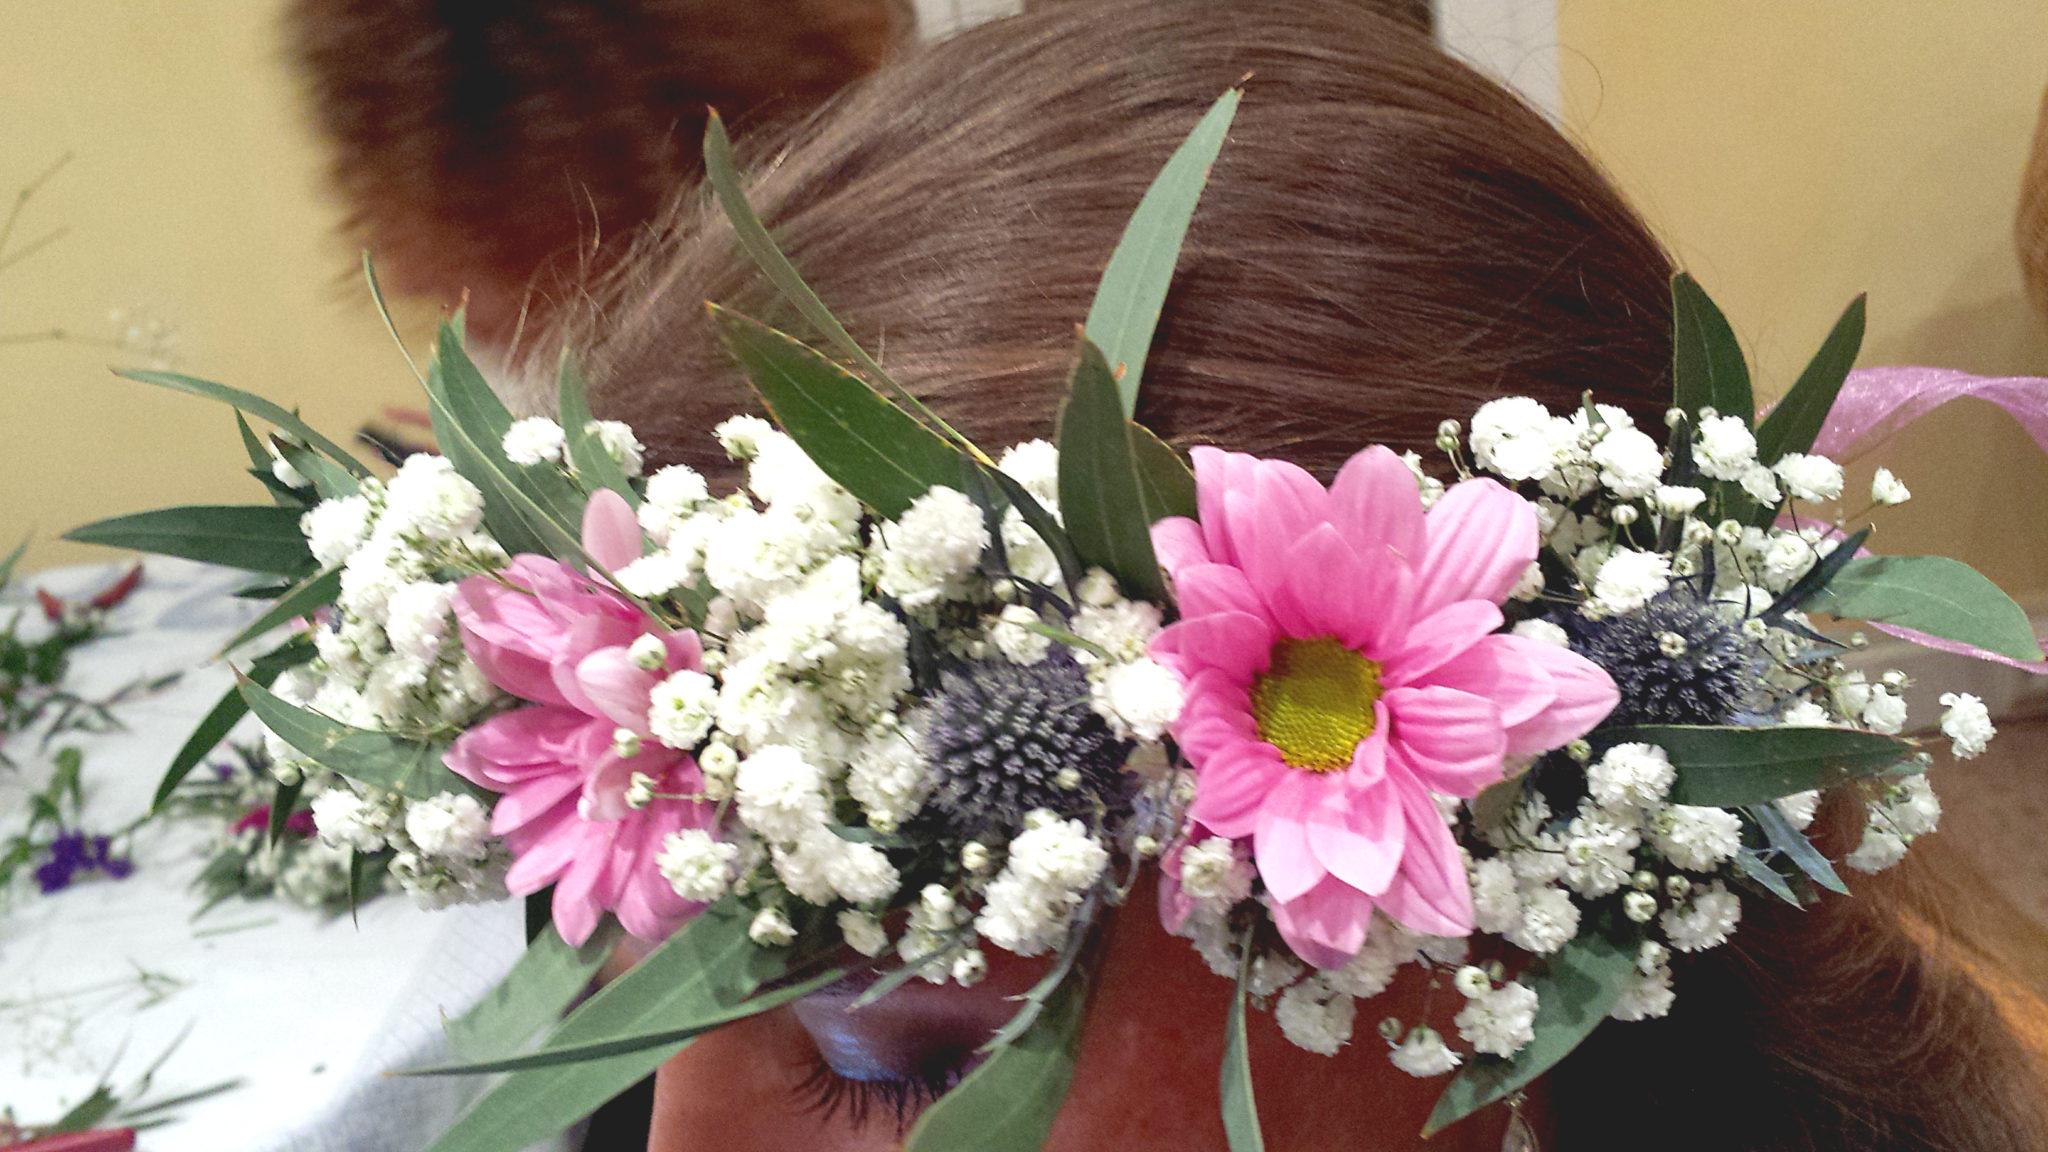 Weleda_bioty_tour_marseille_couronne_fleurs_hema